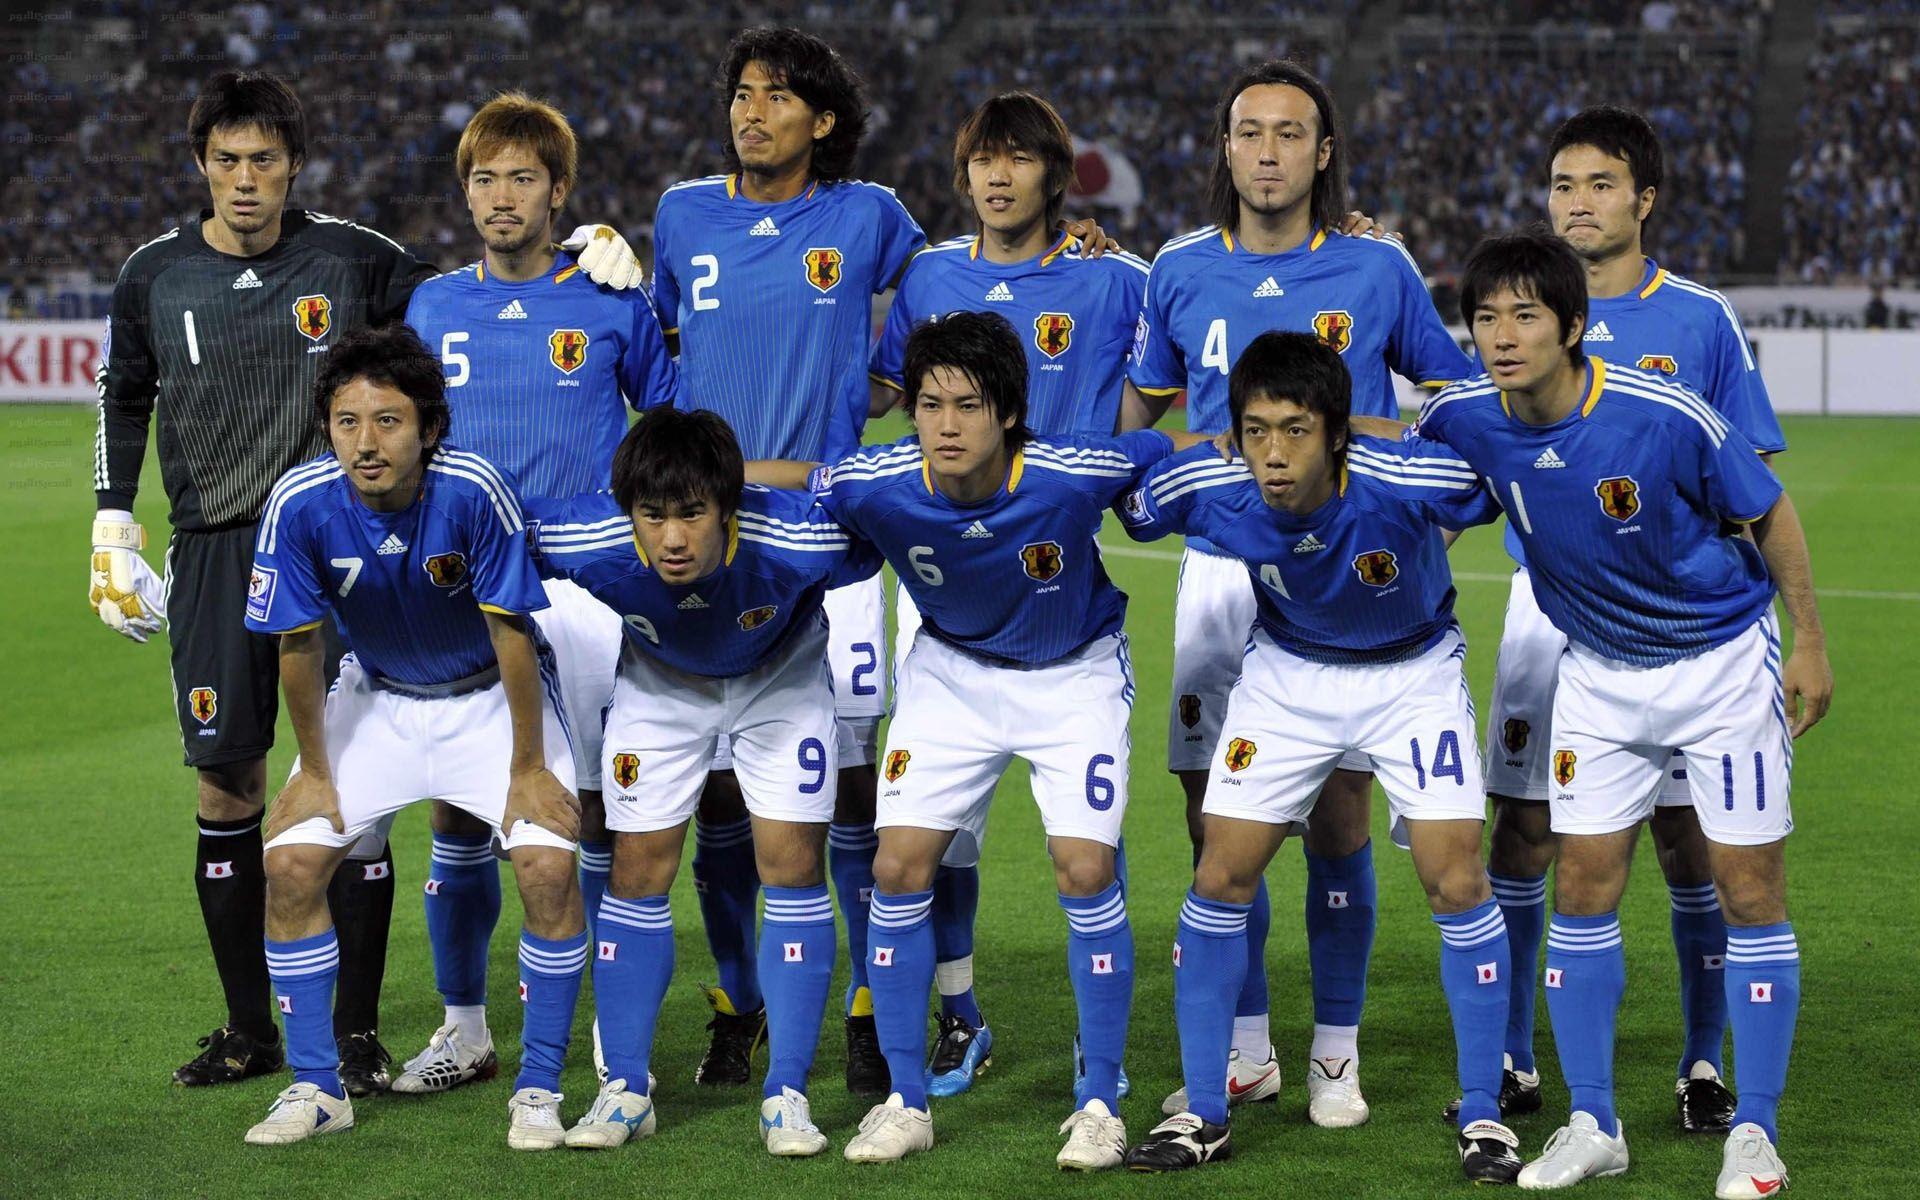 Japan S 2014 World Cup Team Japan World Cup World Cup Teams National Football Teams